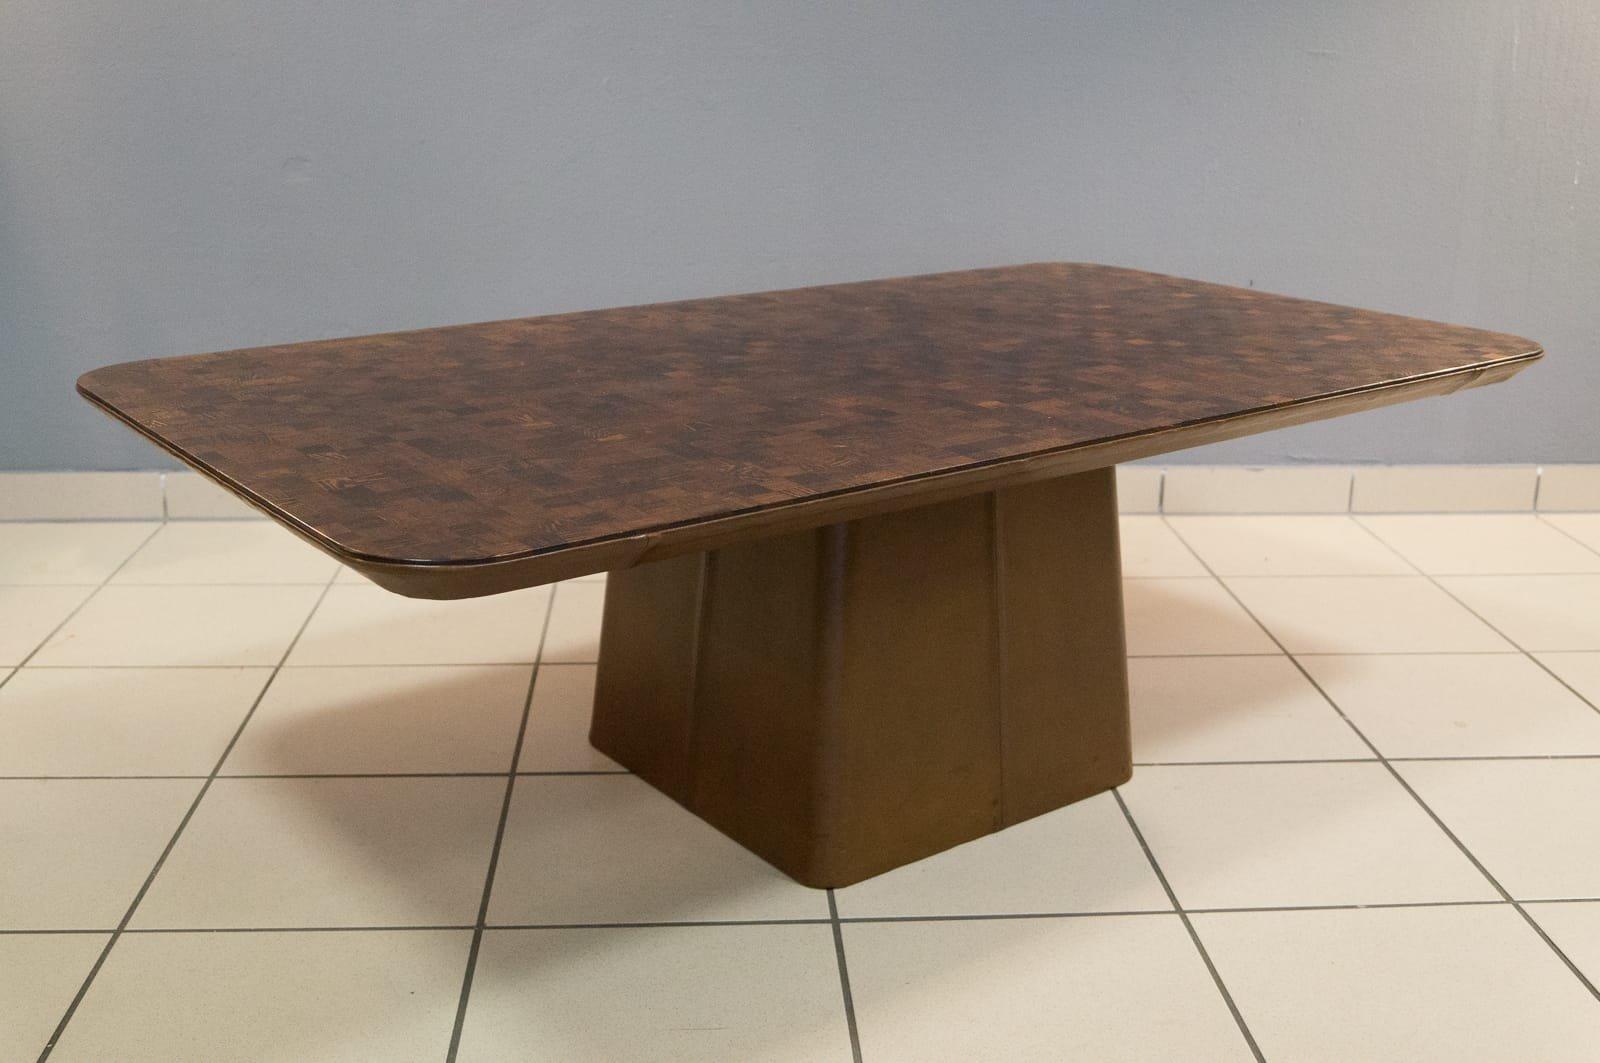 couchtisch aus leder palisander von de sede 1960er bei. Black Bedroom Furniture Sets. Home Design Ideas